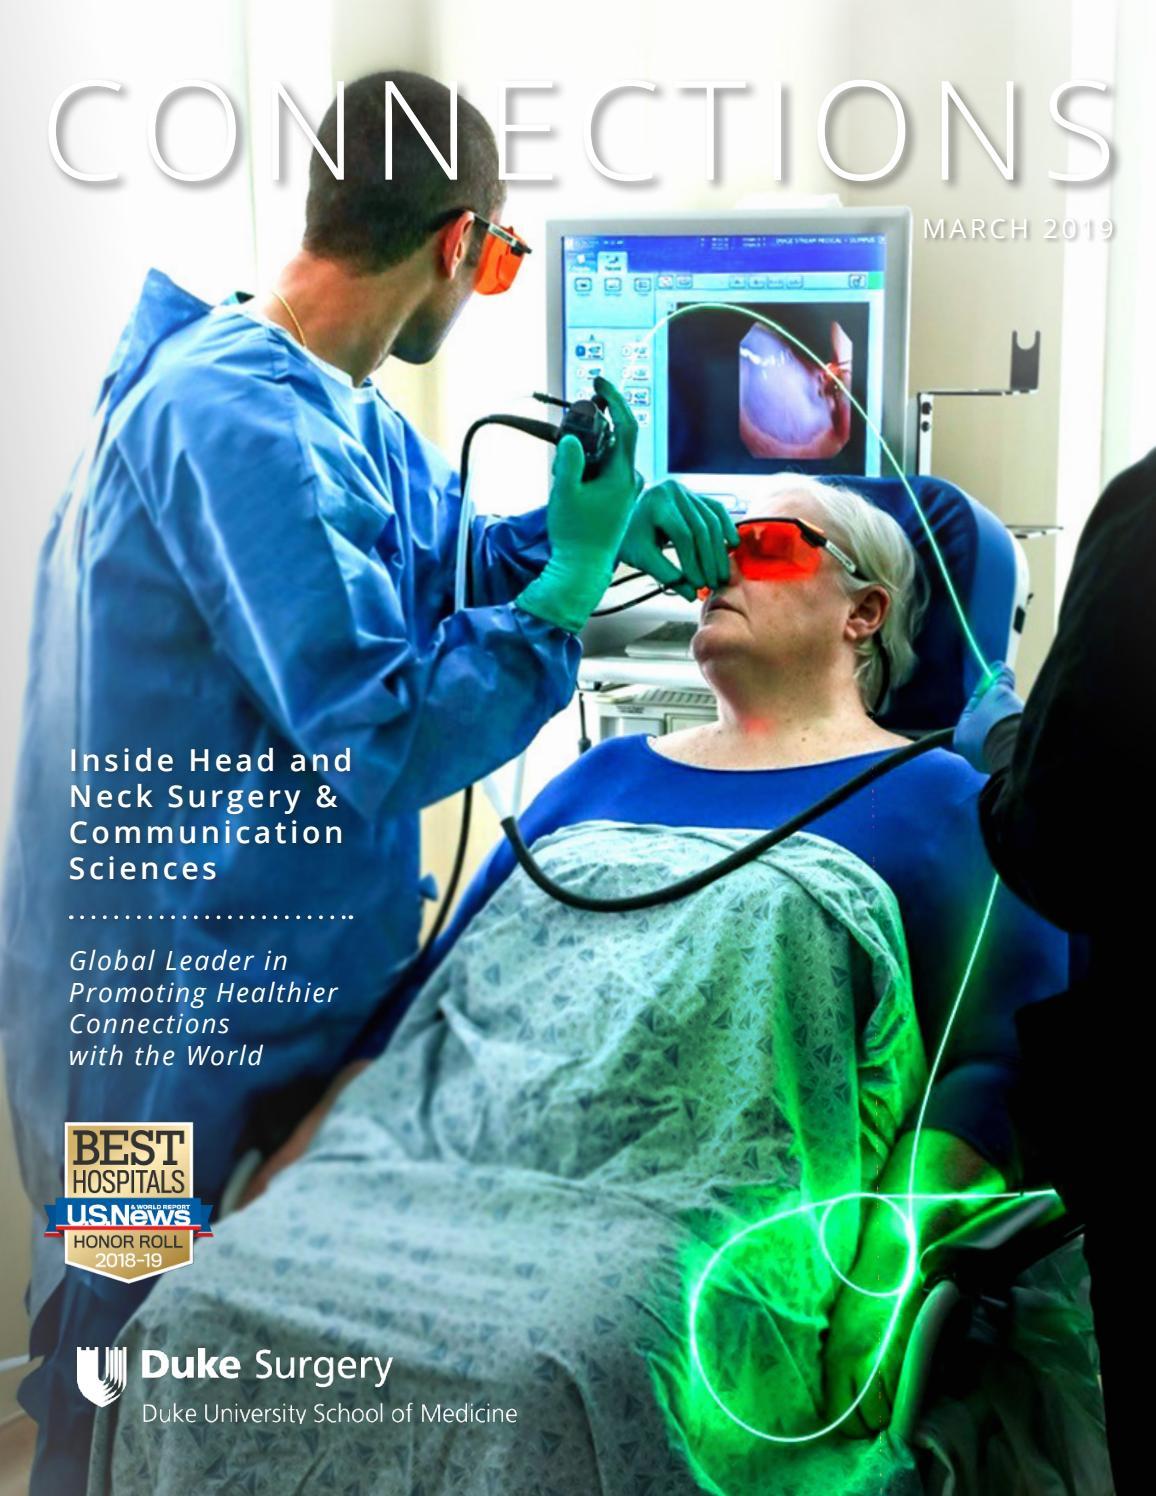 Duke Head and Neck Surgery & Communication Sciences - 2019